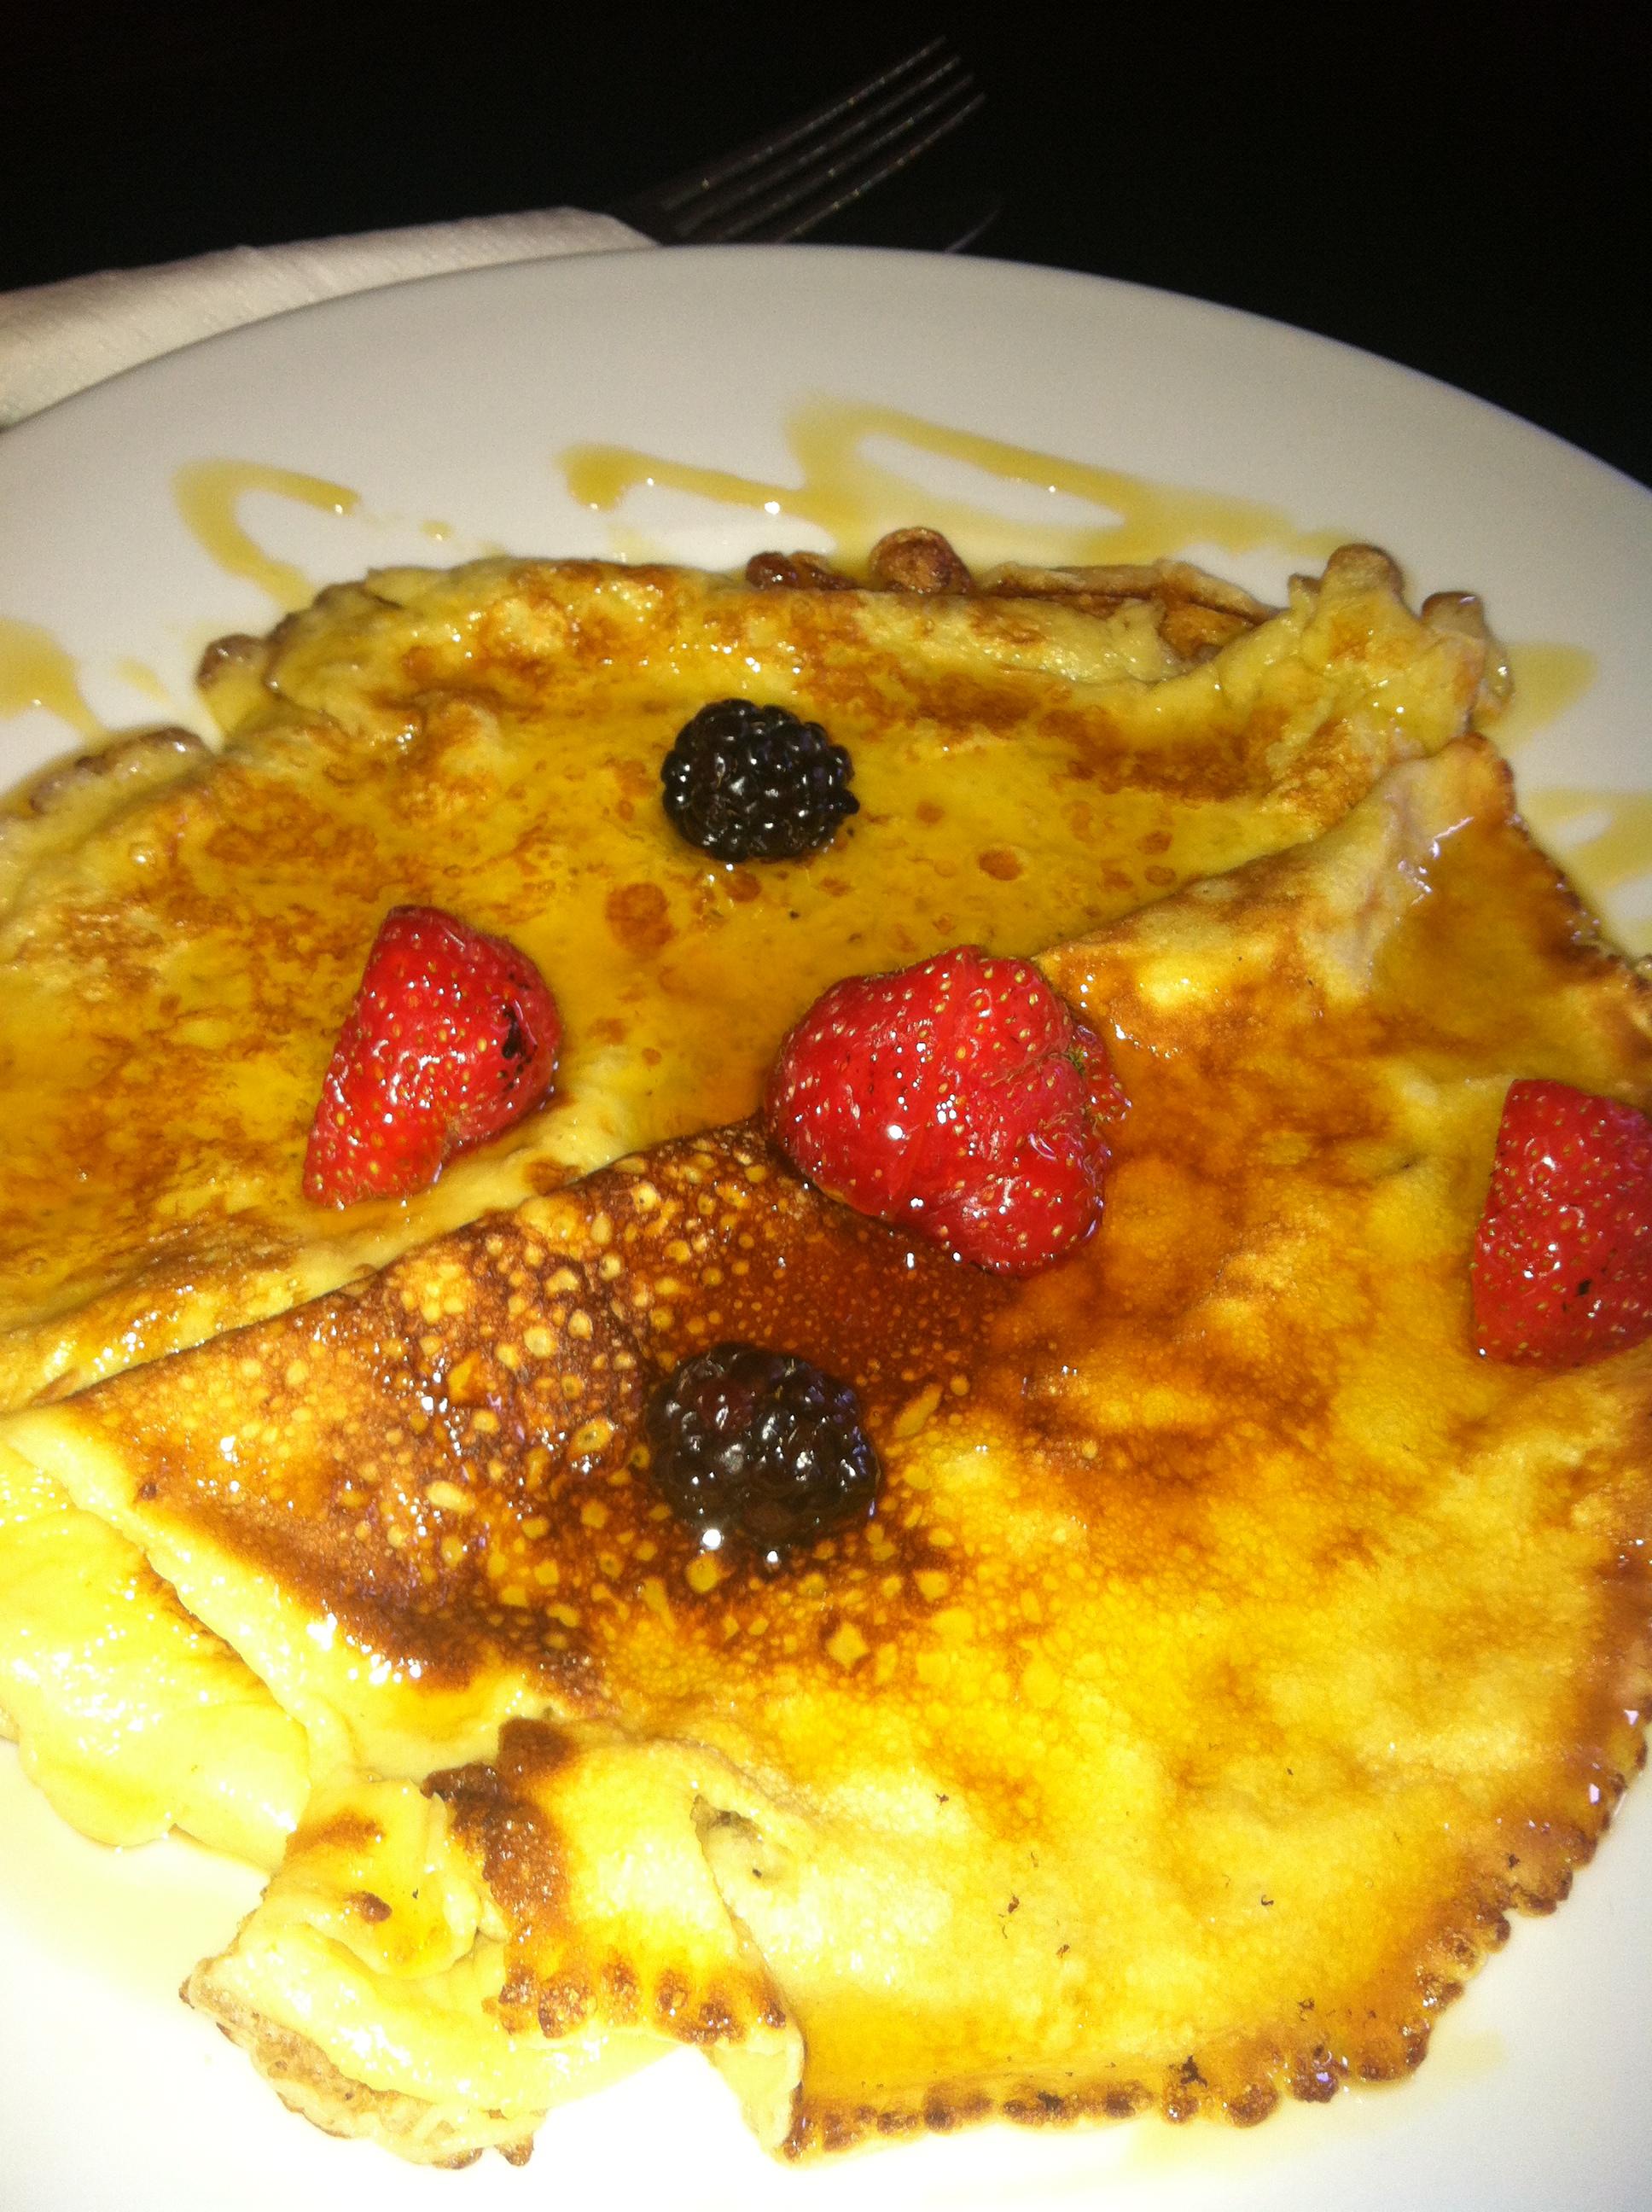 2012-11-20-pancakes.jpg